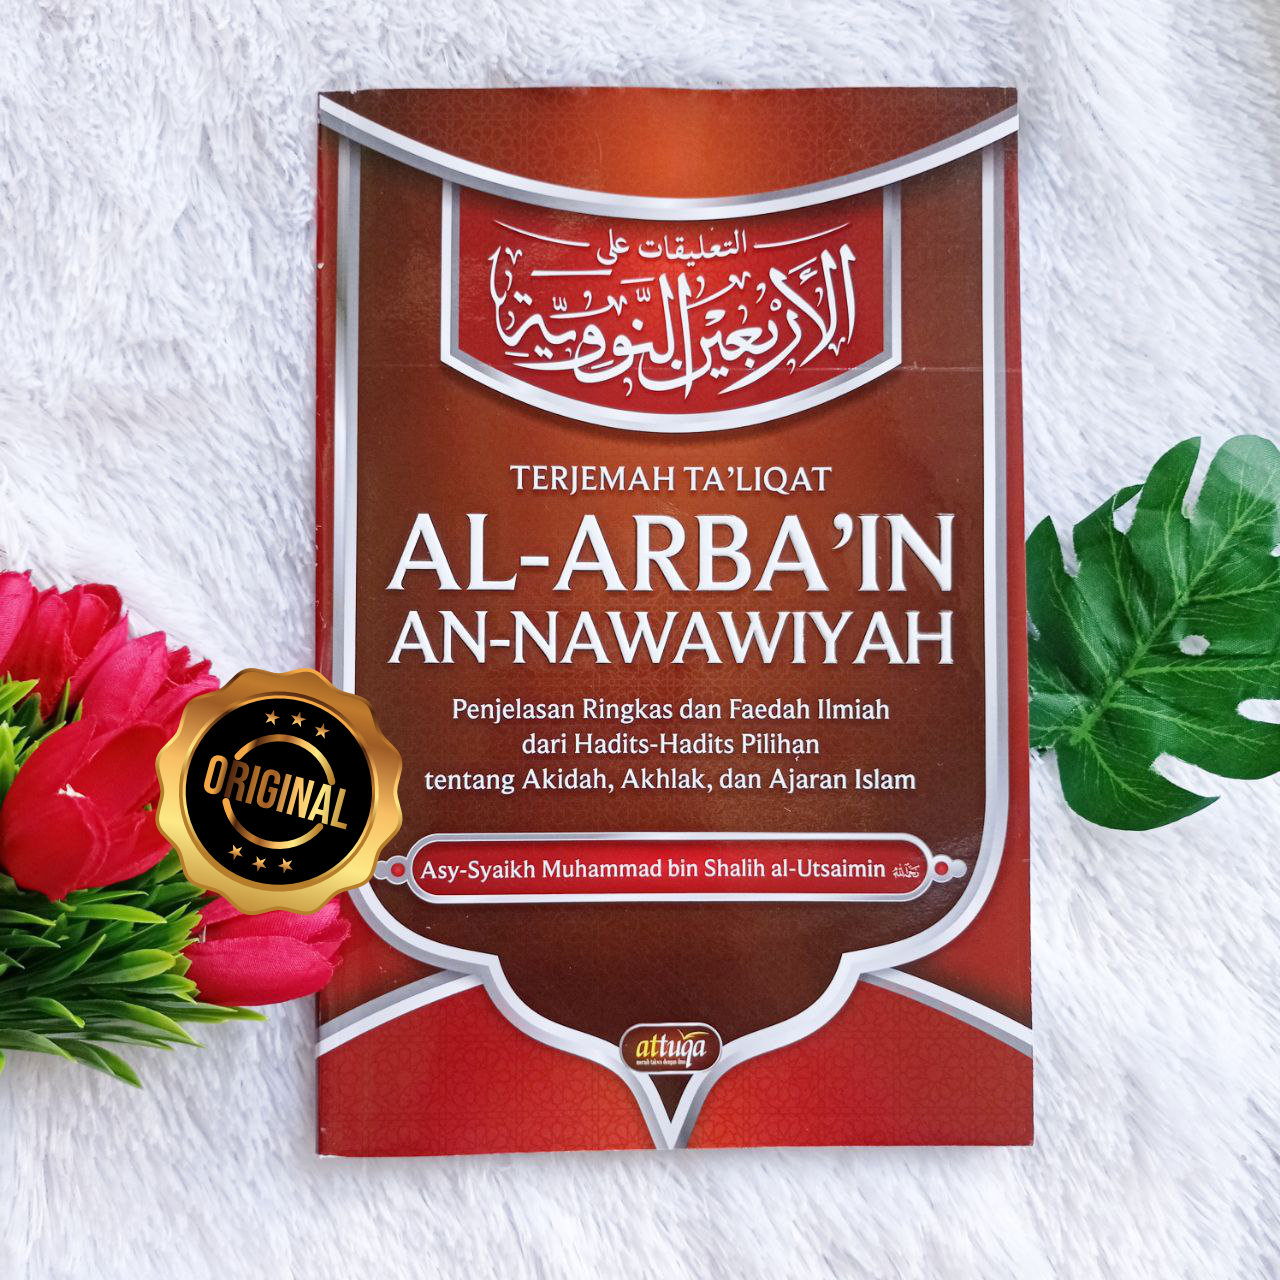 Buku Terjemah Ta'liqat Al-Arba'in An-Nawawiyah Penjelasan Ringkas Hadits Pilihan